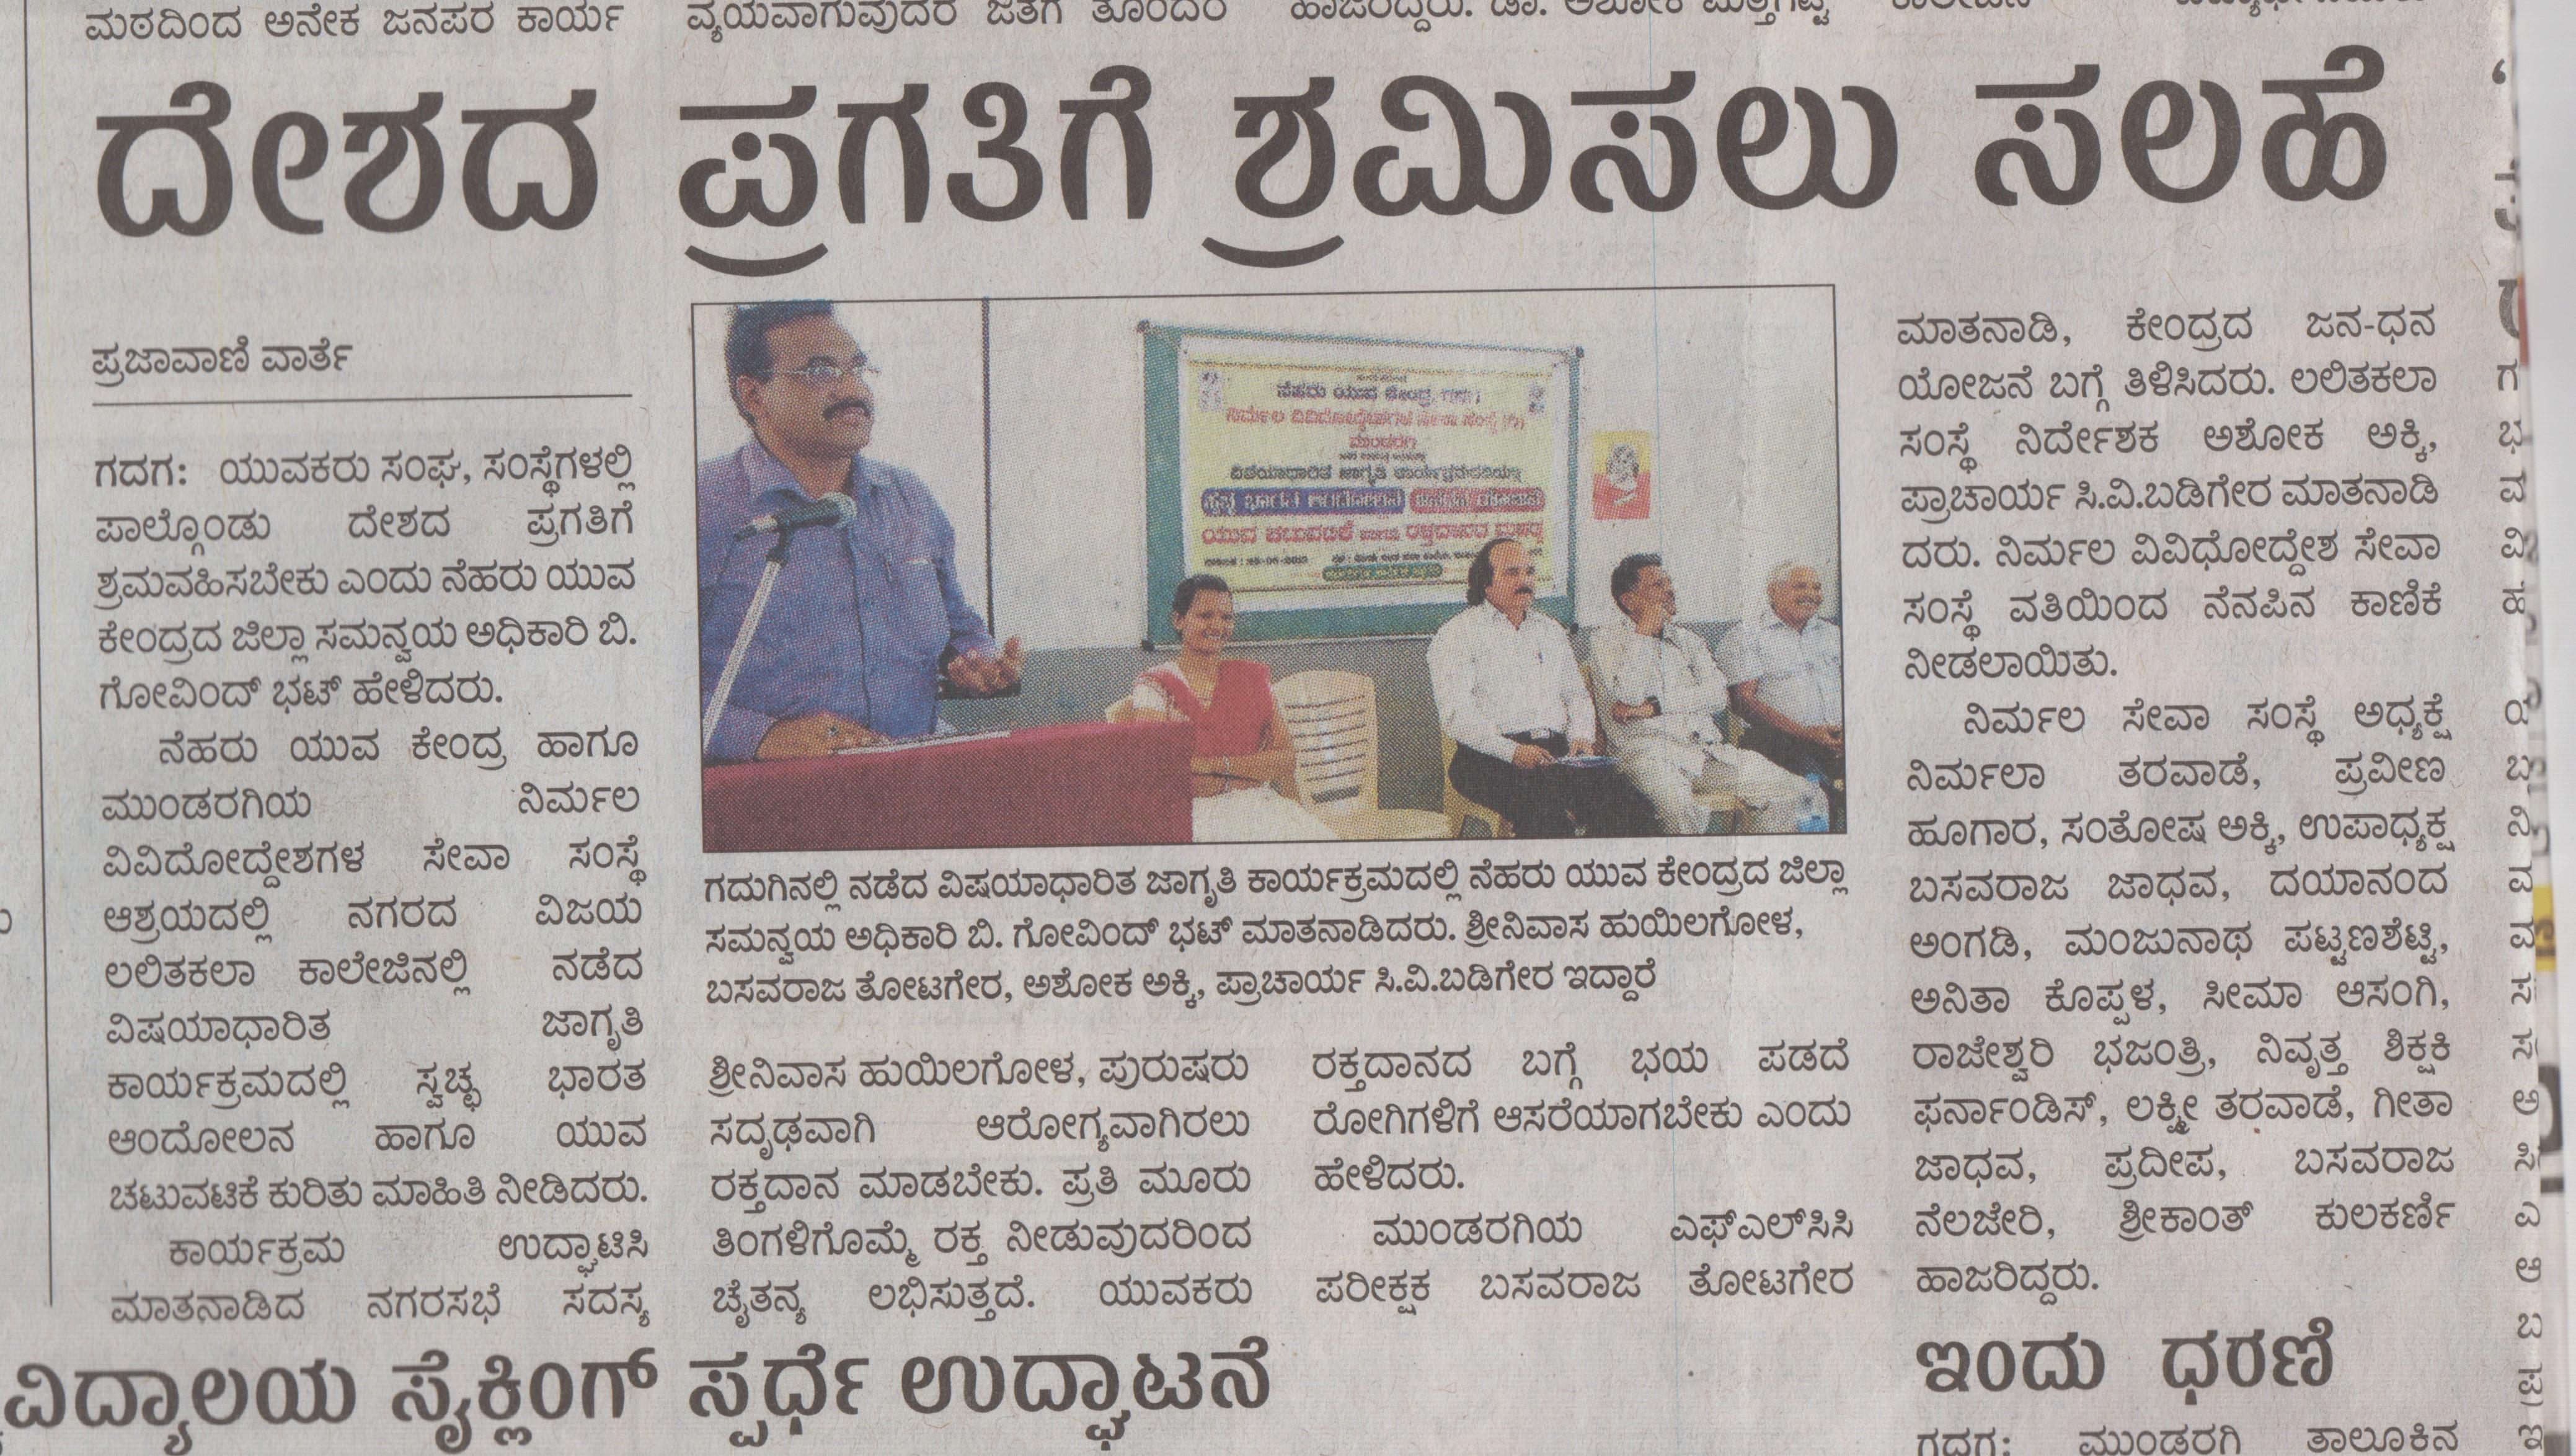 /media/nirmalavss/1NGO-00290-Nirmala_Vivedodeshagala_Seva_Samsthe-Paper_Media_Coverage-2.jpg